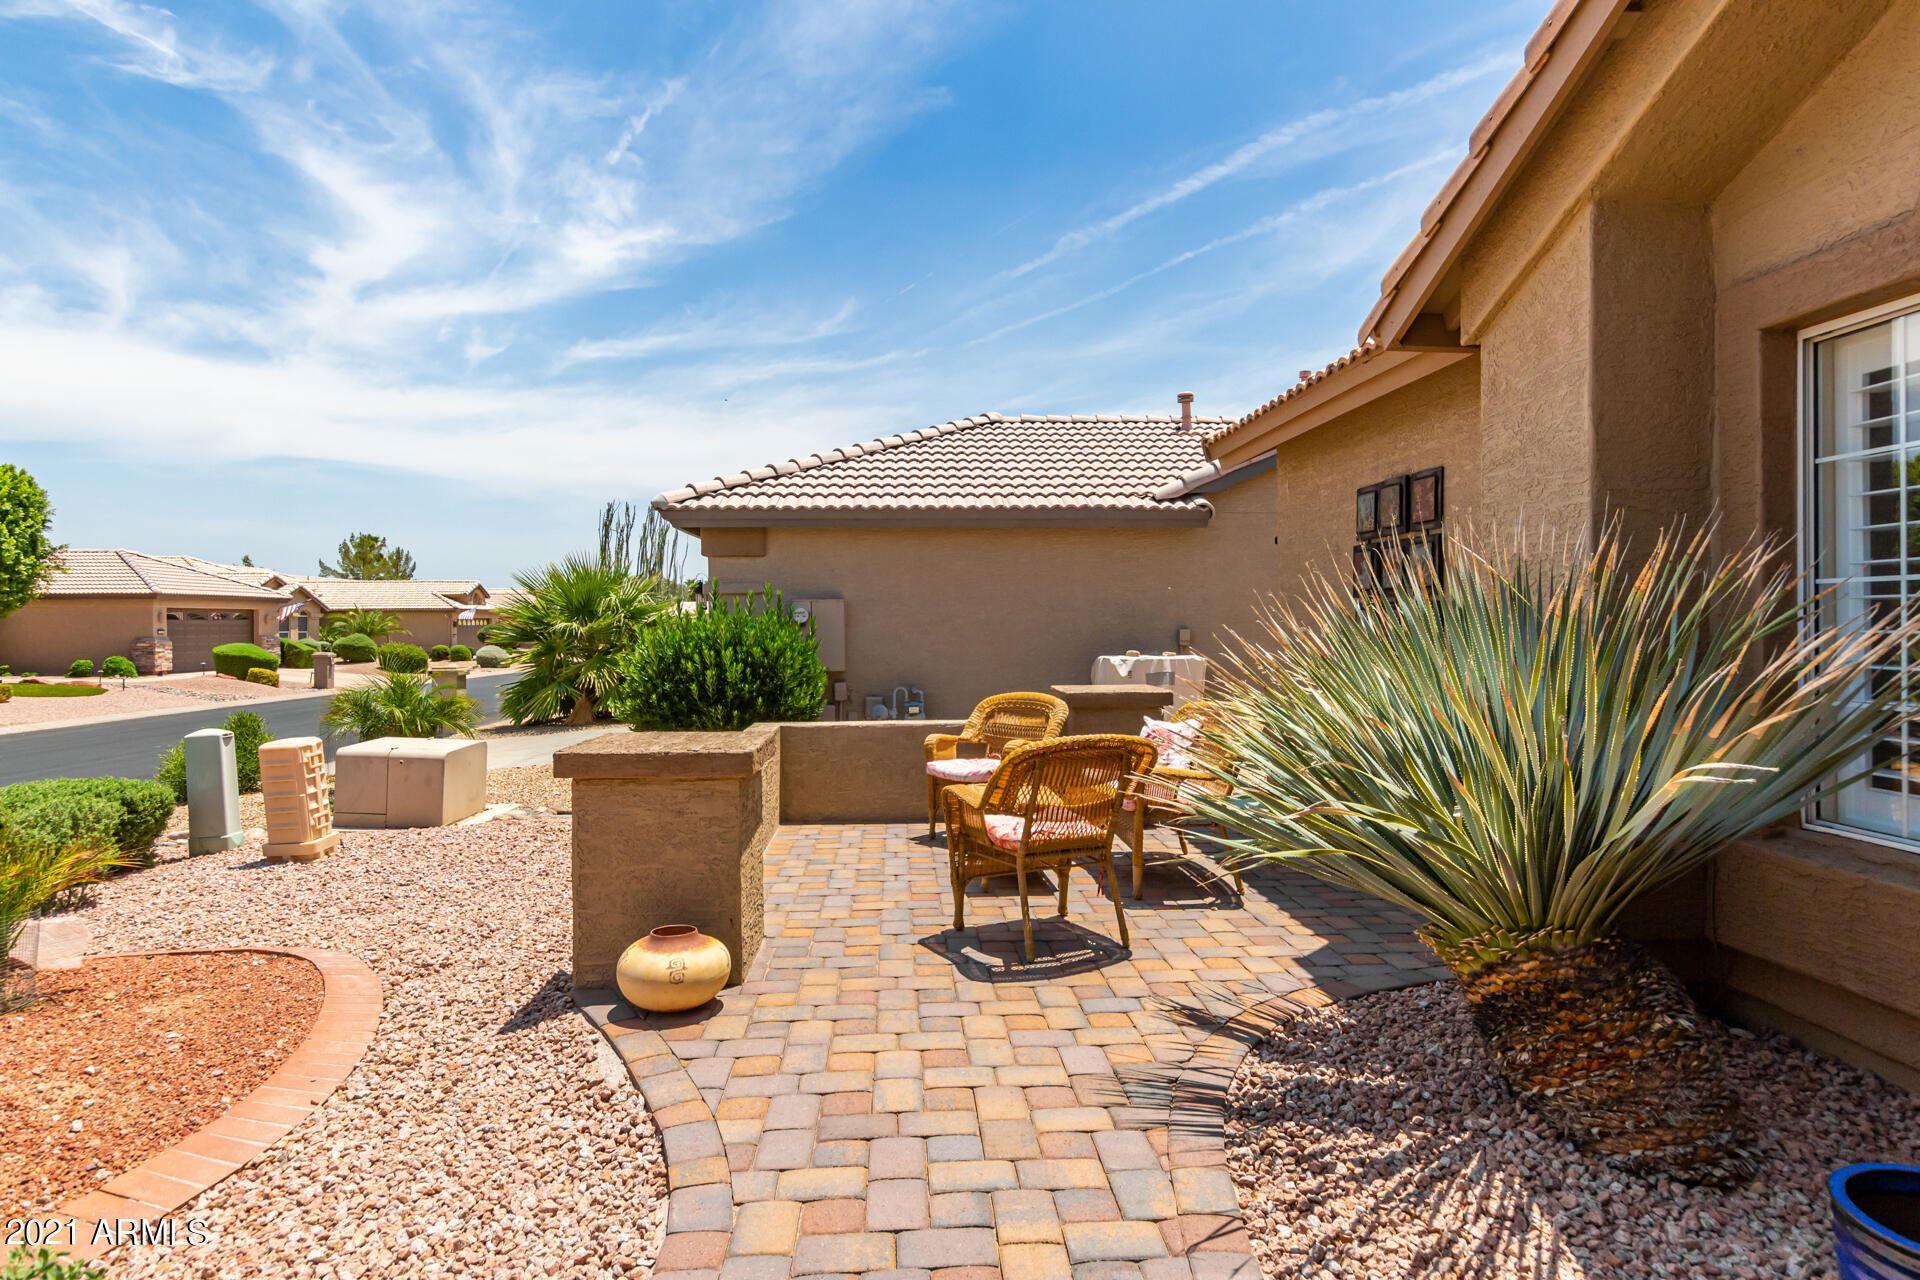 Photo of 3598 N Casper Drive, Goodyear, AZ 85395 (MLS # 6268631)